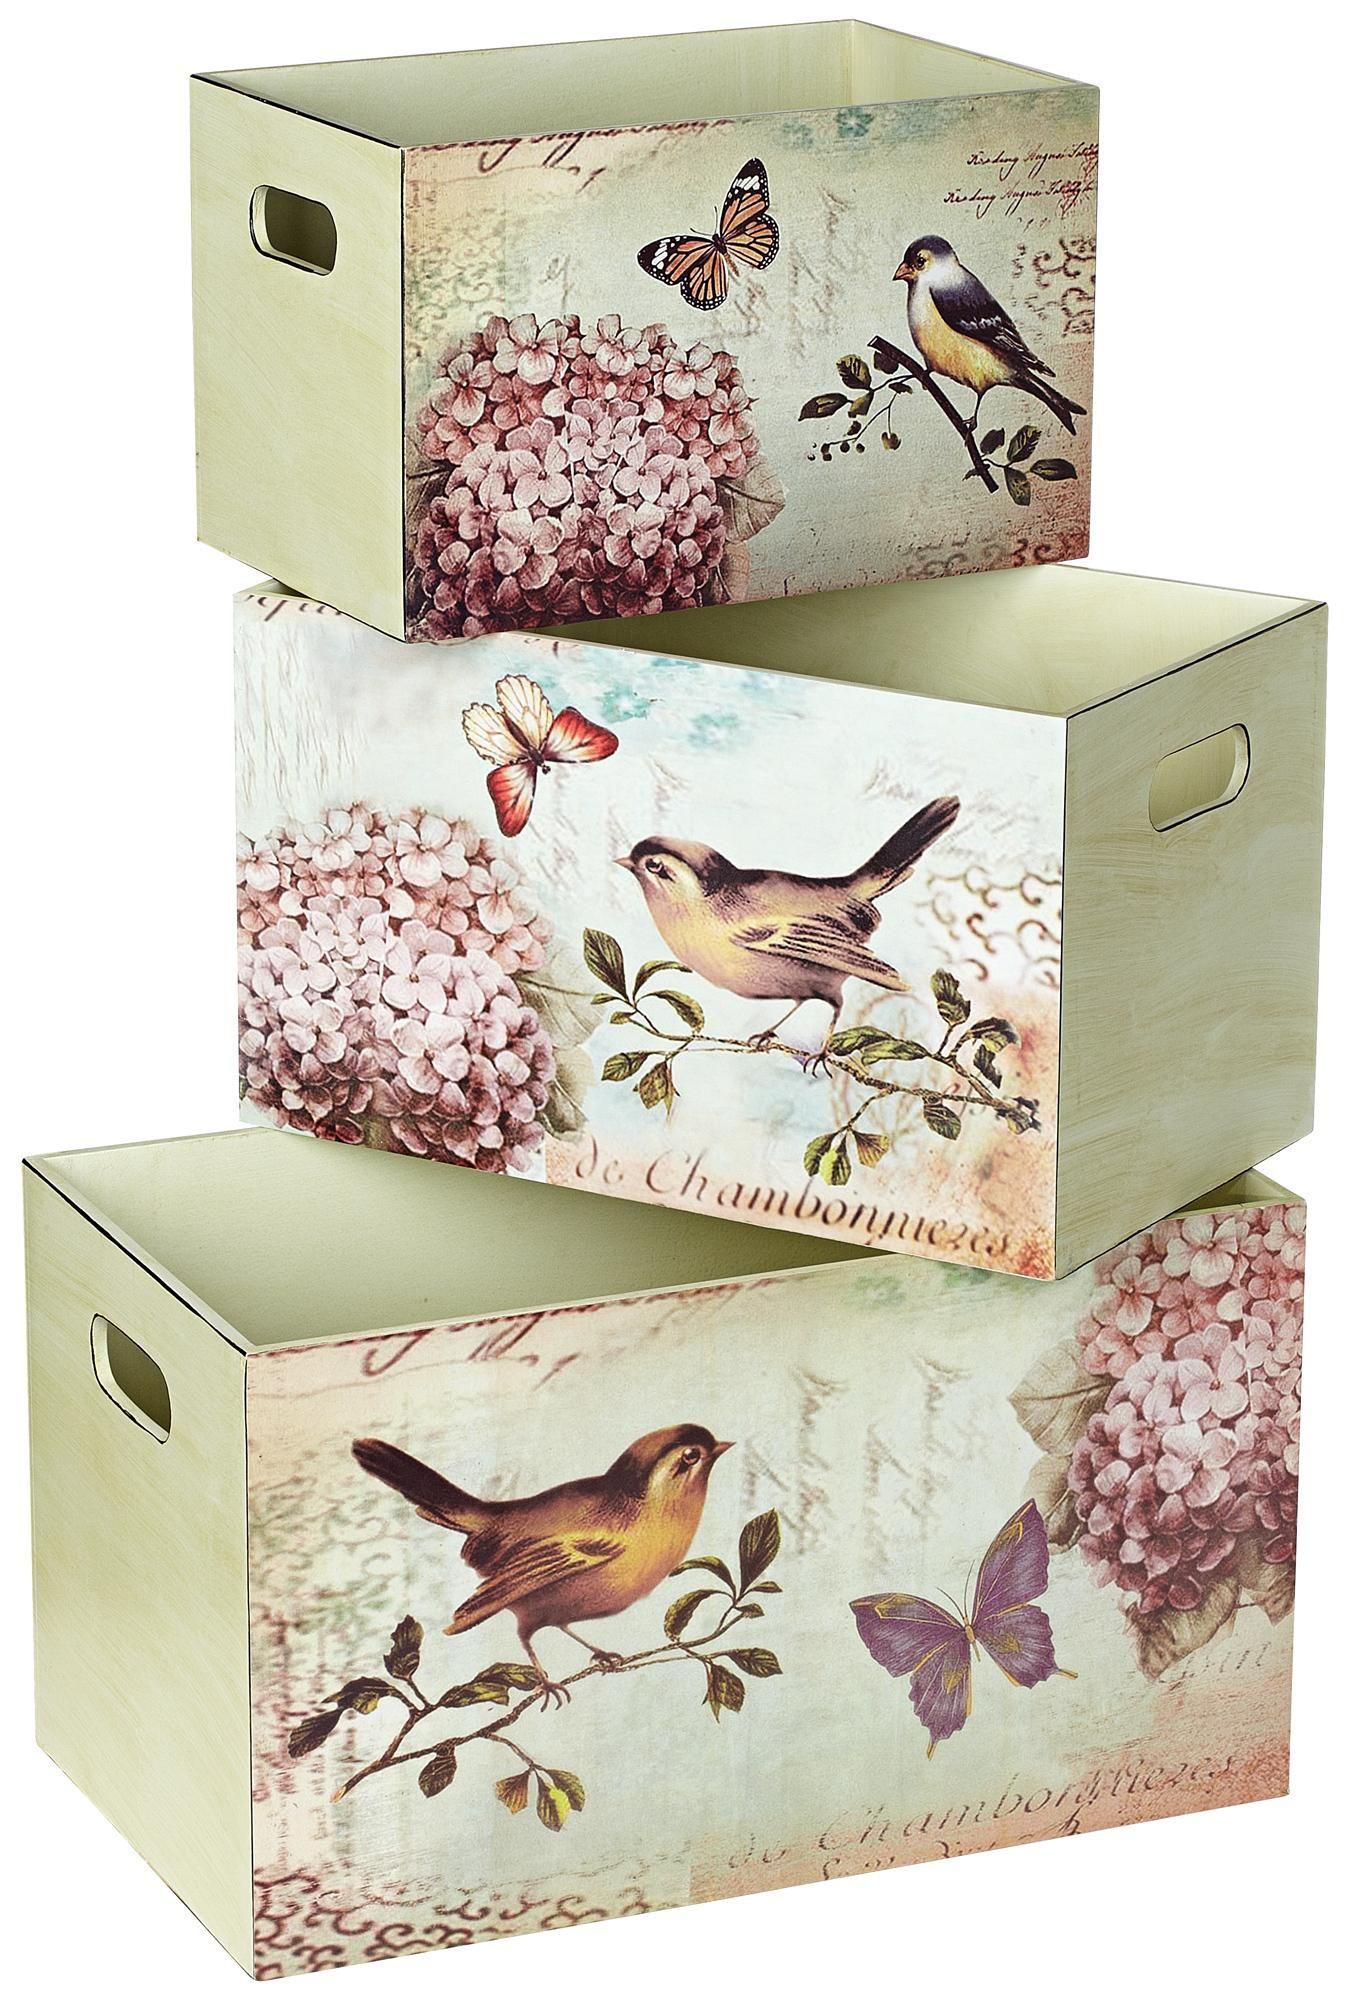 set of 3 bird design decorative storage boxes con decoupage - Decorative Storage Boxes